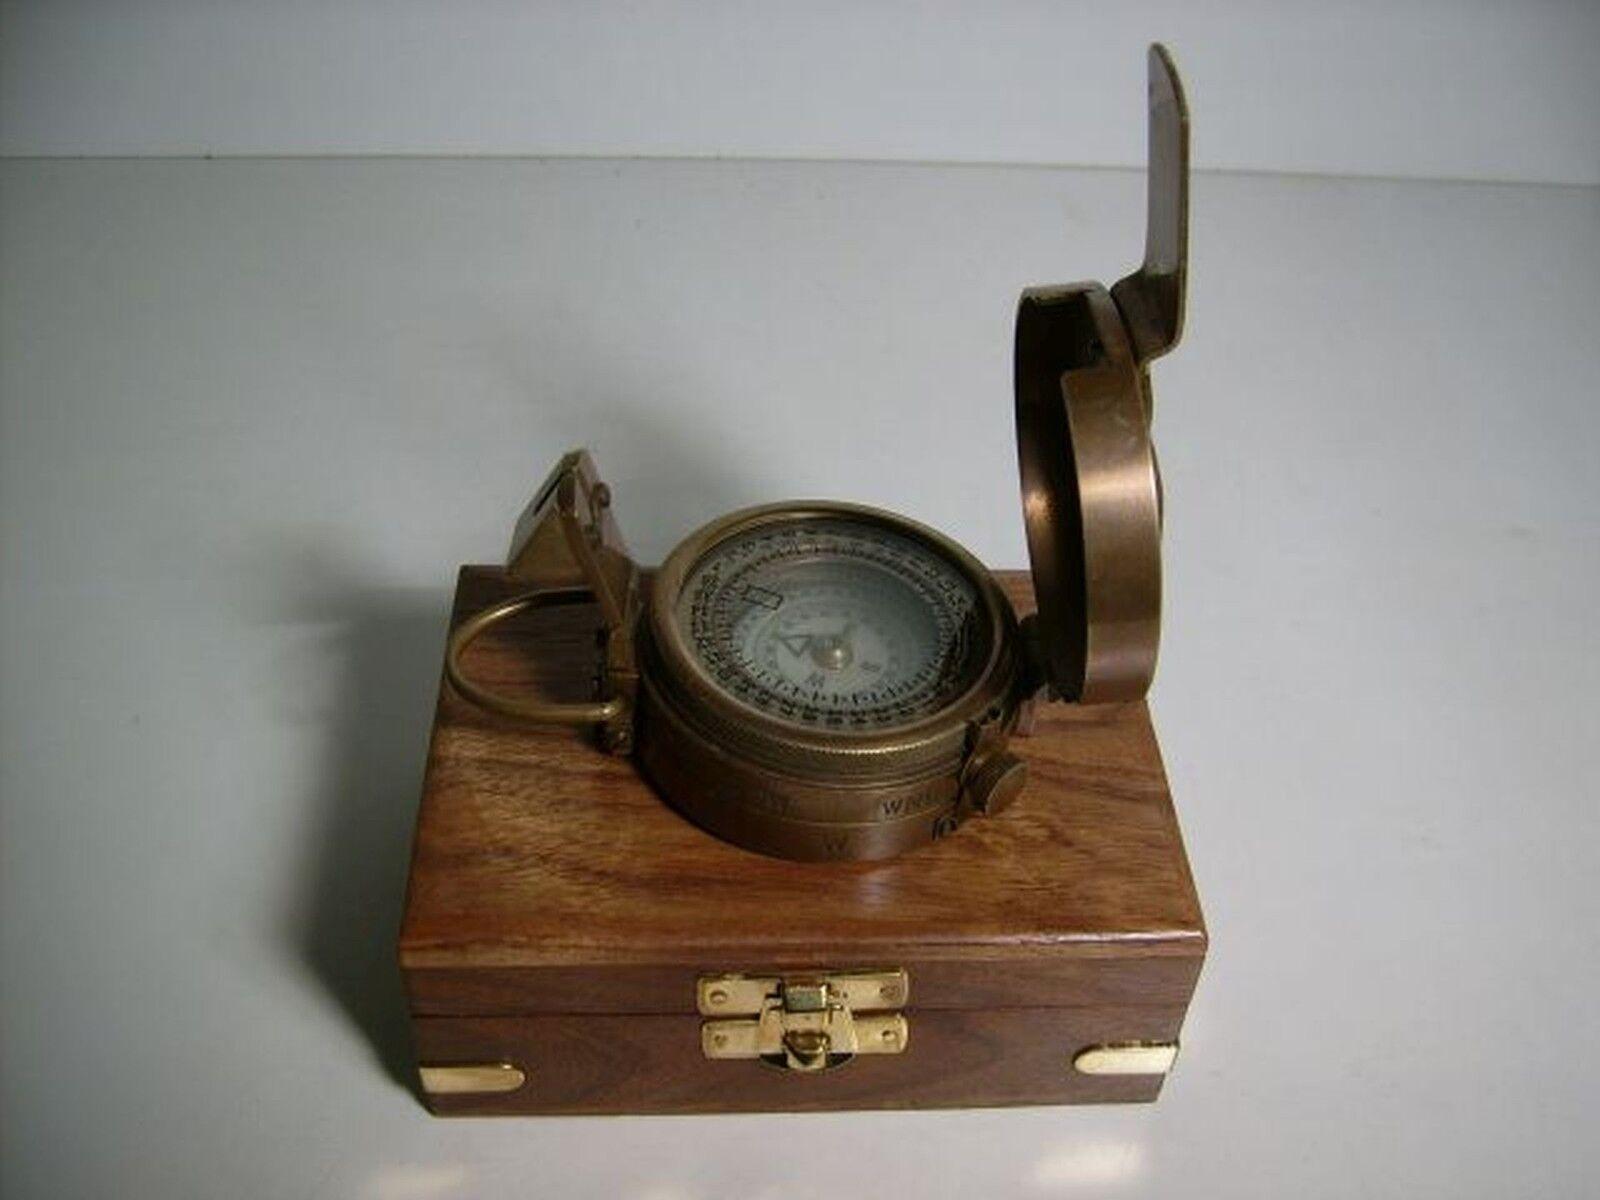 Peilkompass, coffret, orientation, abenteuerer, abenteuerer, abenteuerer, navigateur, marcheurs, décoration ea5584